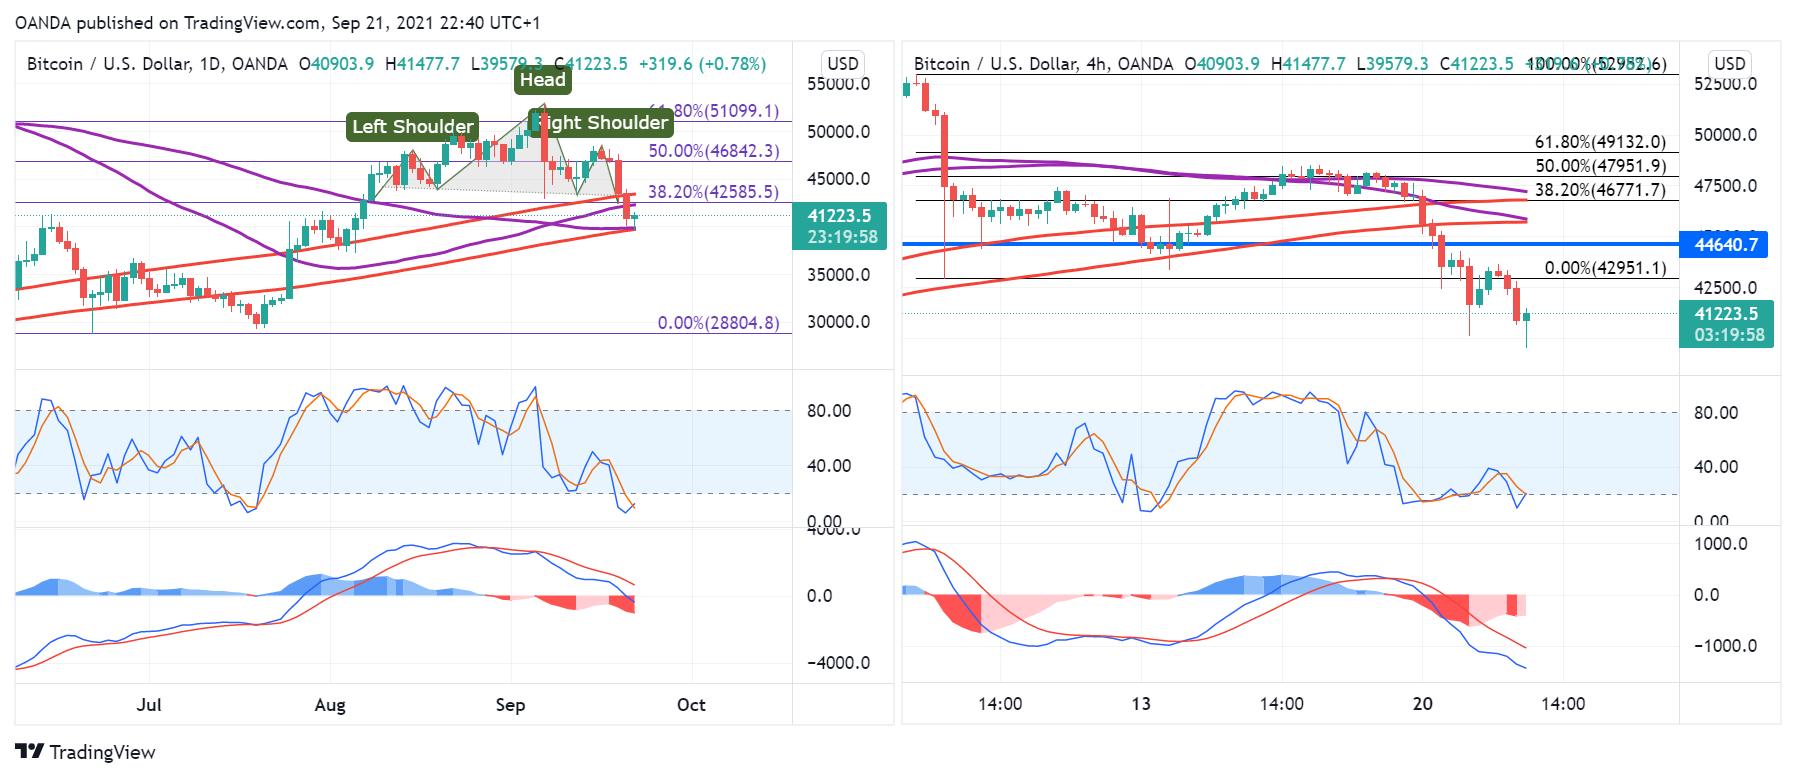 BTC/USD Daily & 4-Hr Chart